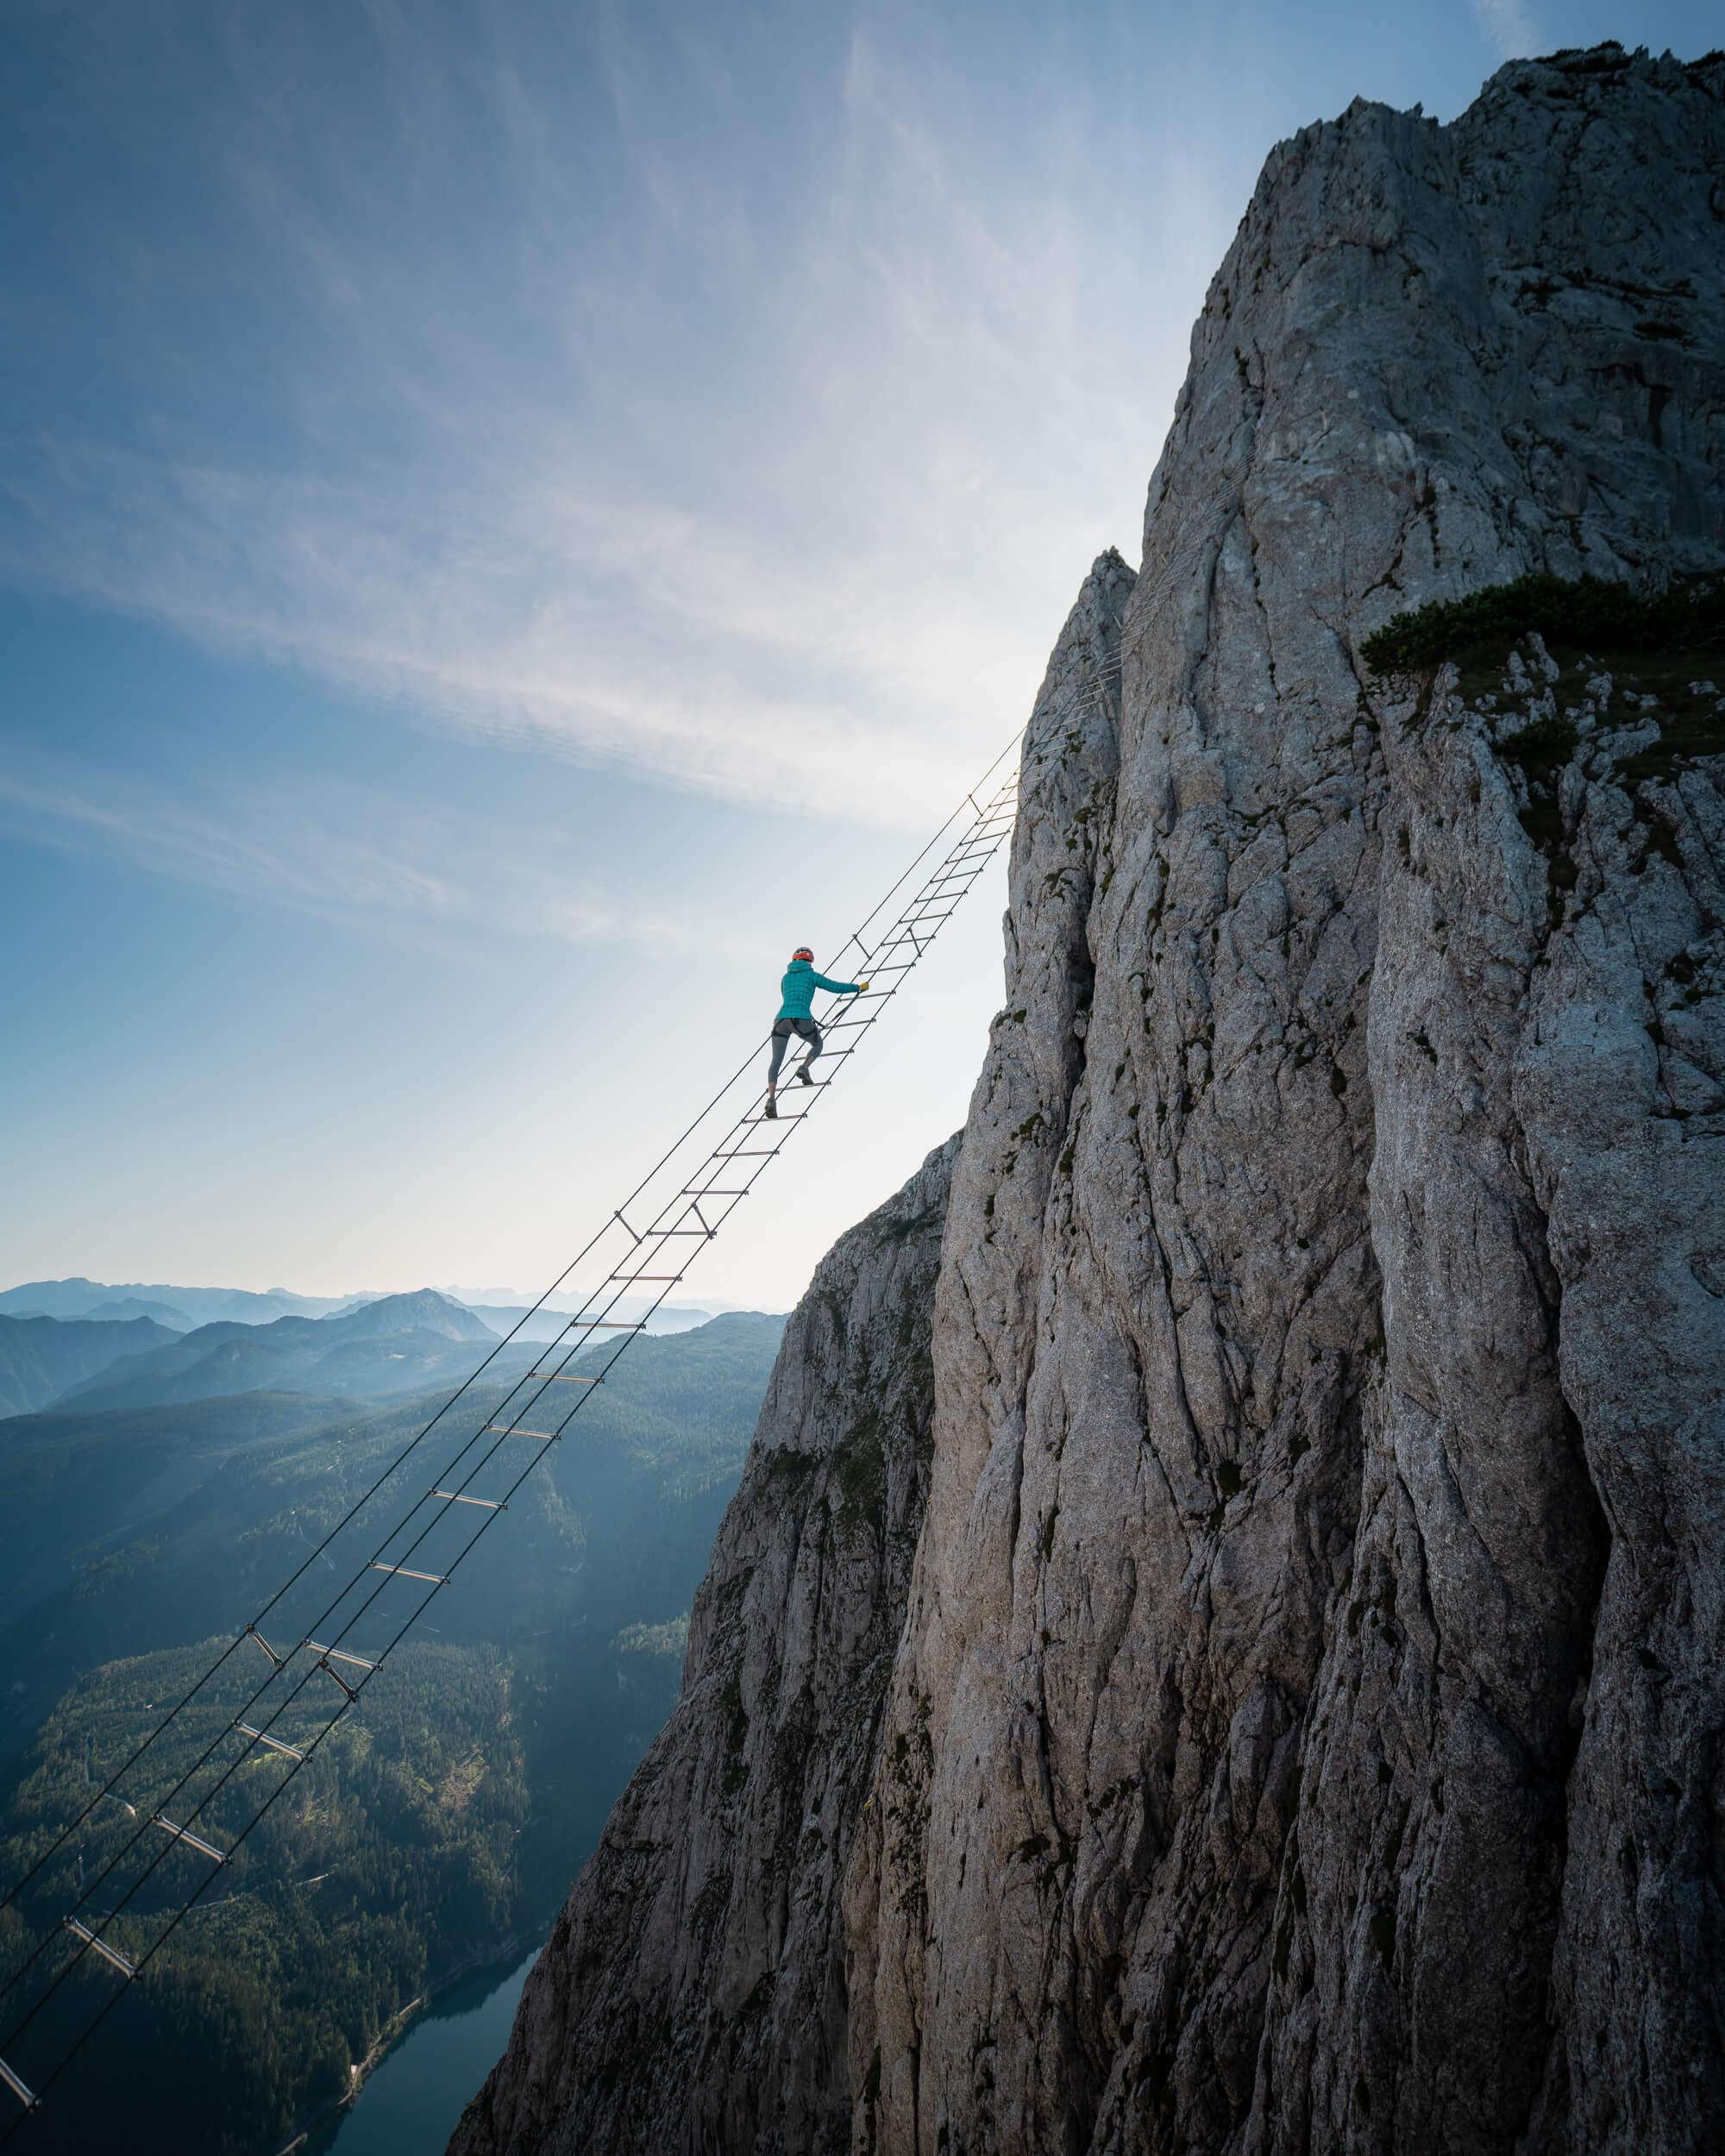 Sky Ladder via ferrata Austria